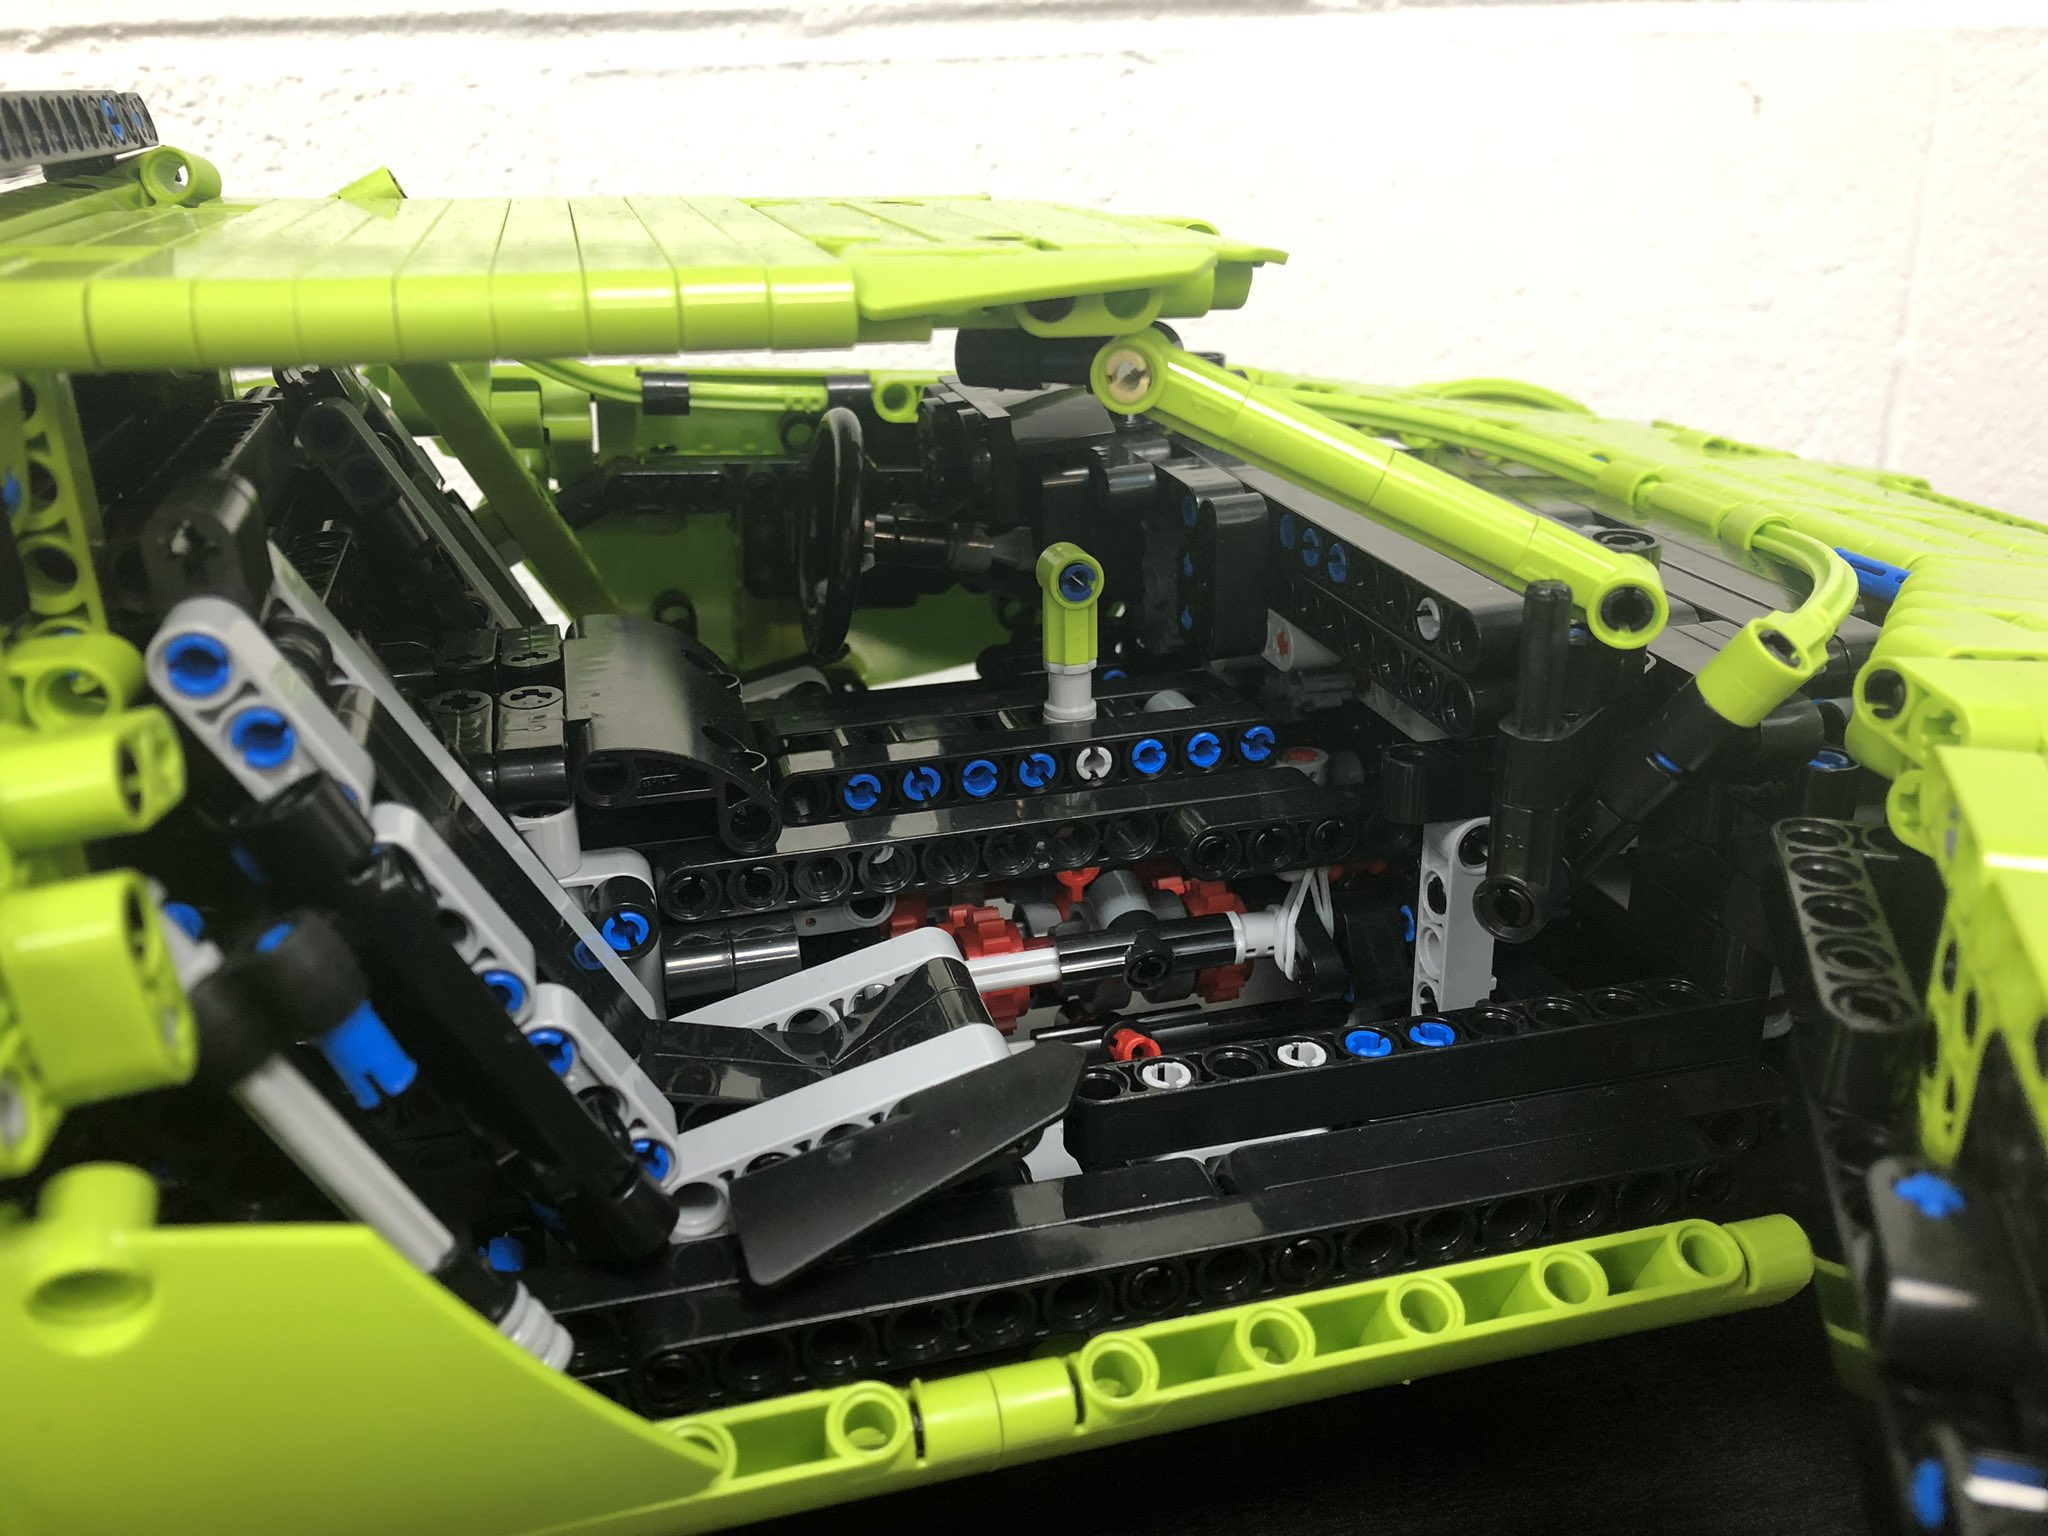 Lego Technic Lancia Stratos Porsche GT3 RS kit (3)